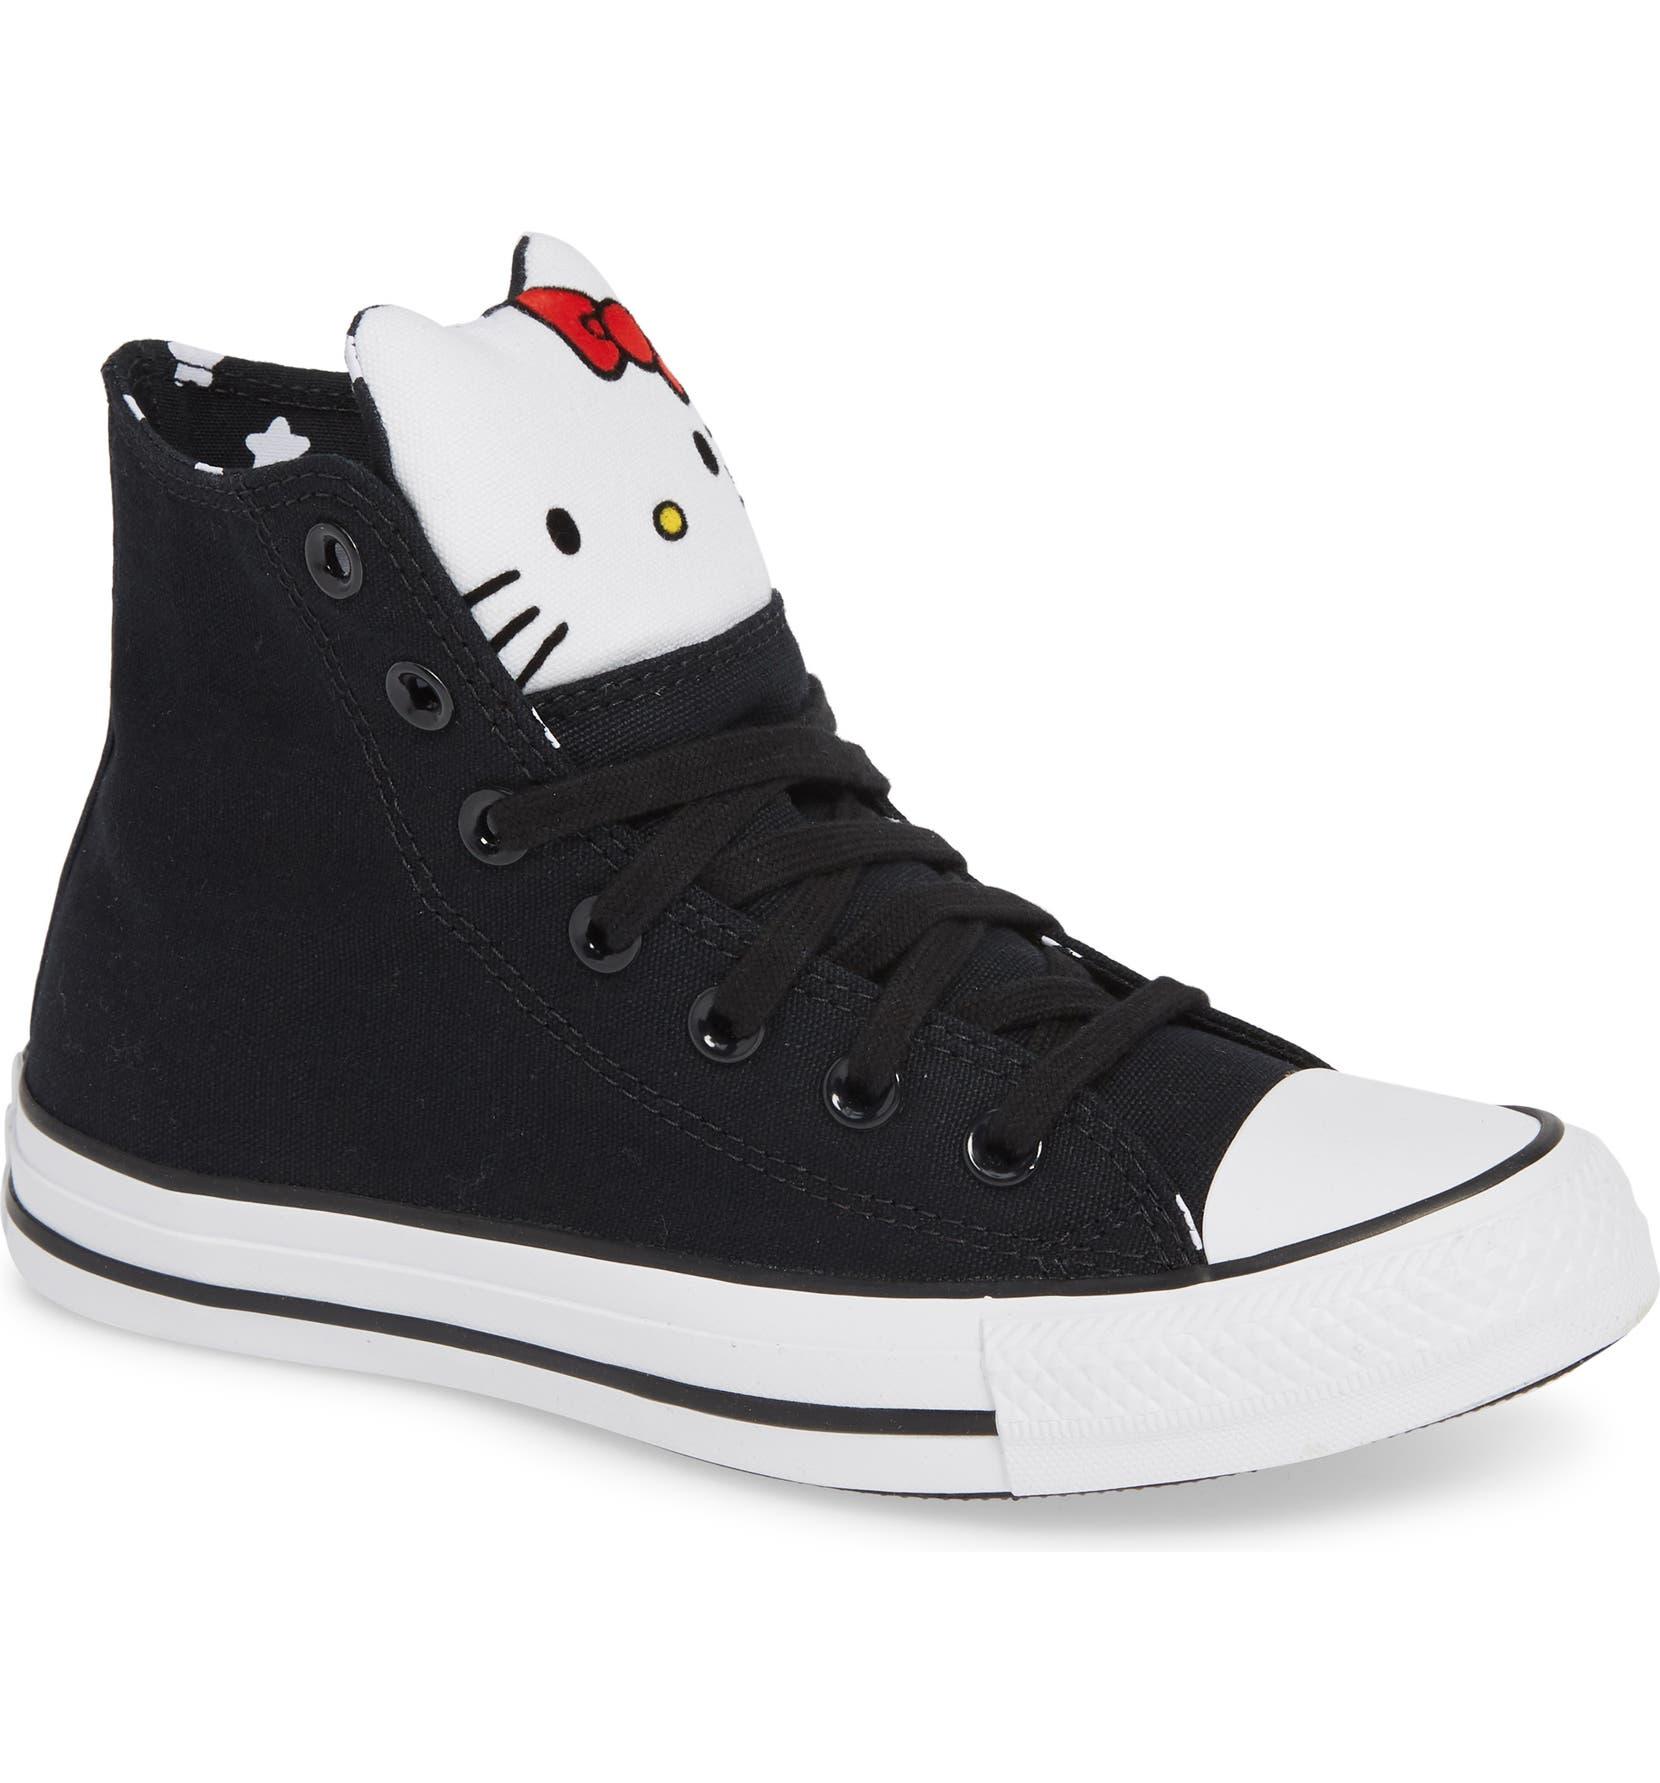 de7fd750b97 Converse x Hello Kitty® Chuck Taylor® All Star® High Top Sneaker (Women) |  Nordstrom